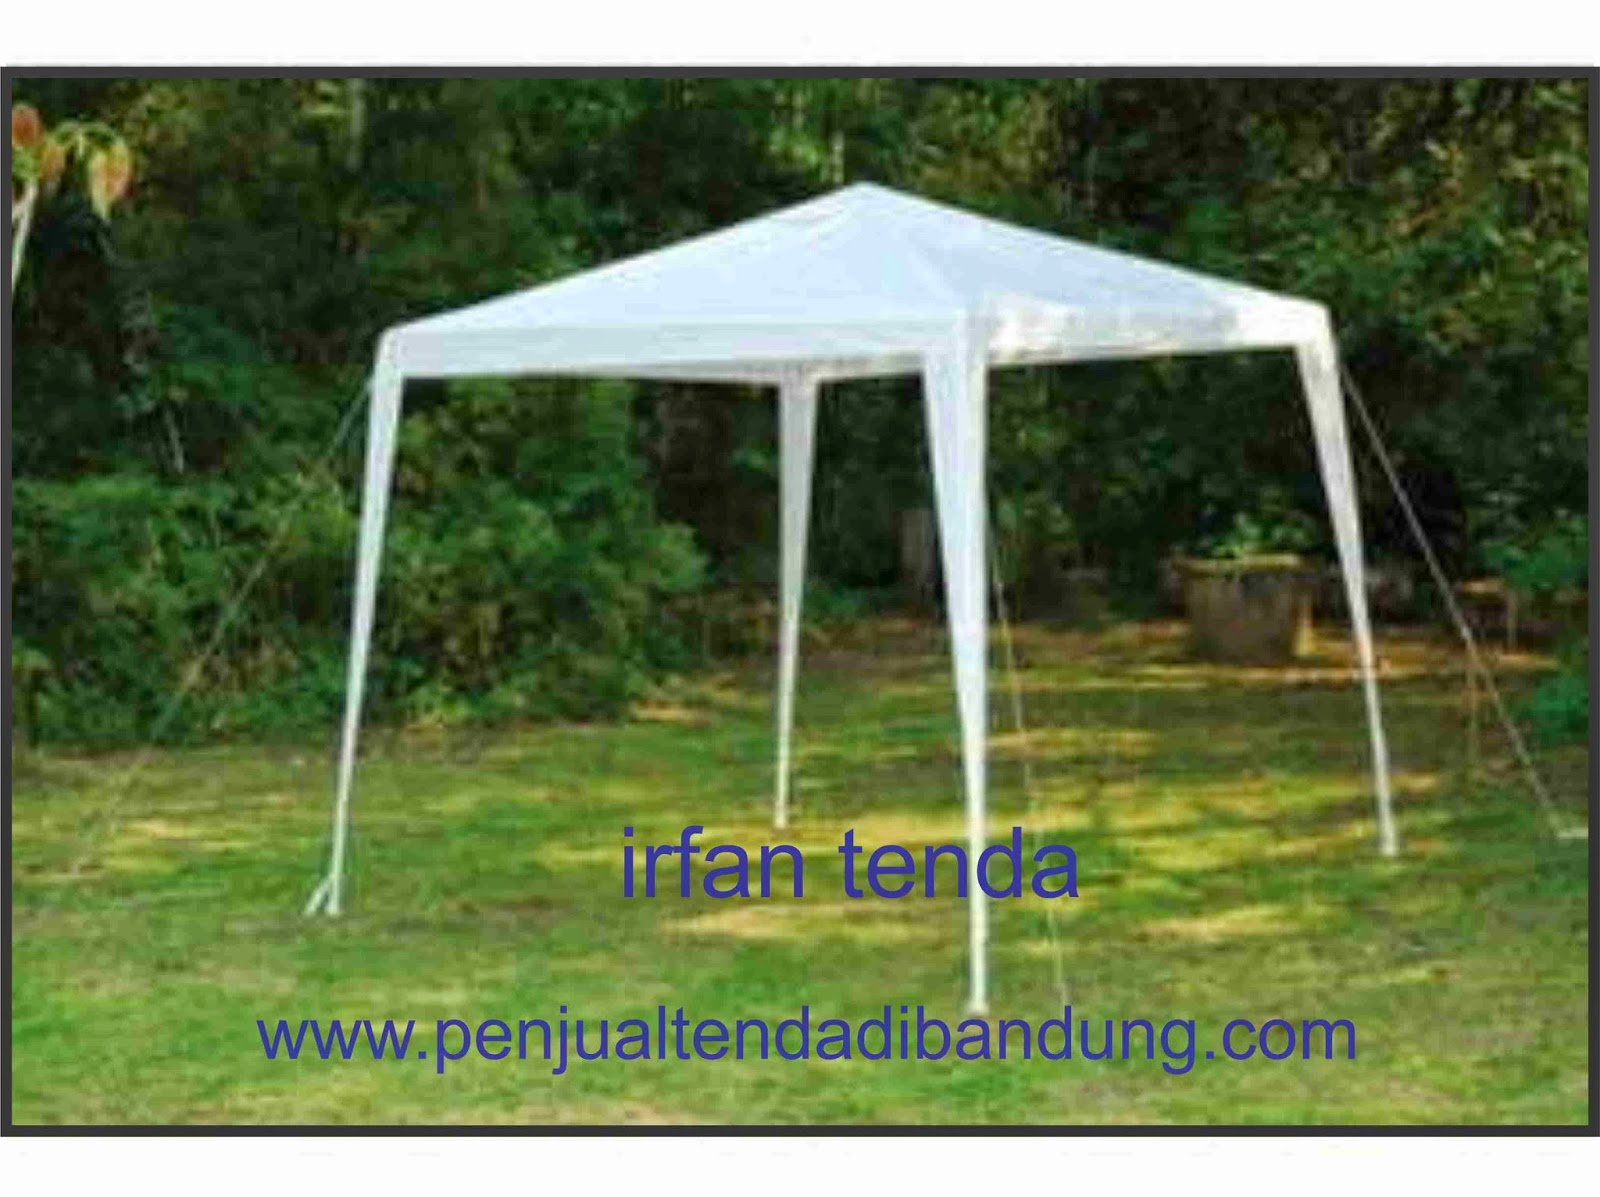 TENDA GAZEBO, Penjual tenda gazebo di bandung, menjual tenda gazebo, menyediakan tenda gazebo, menjual tenda gazebo dengan harga murah.